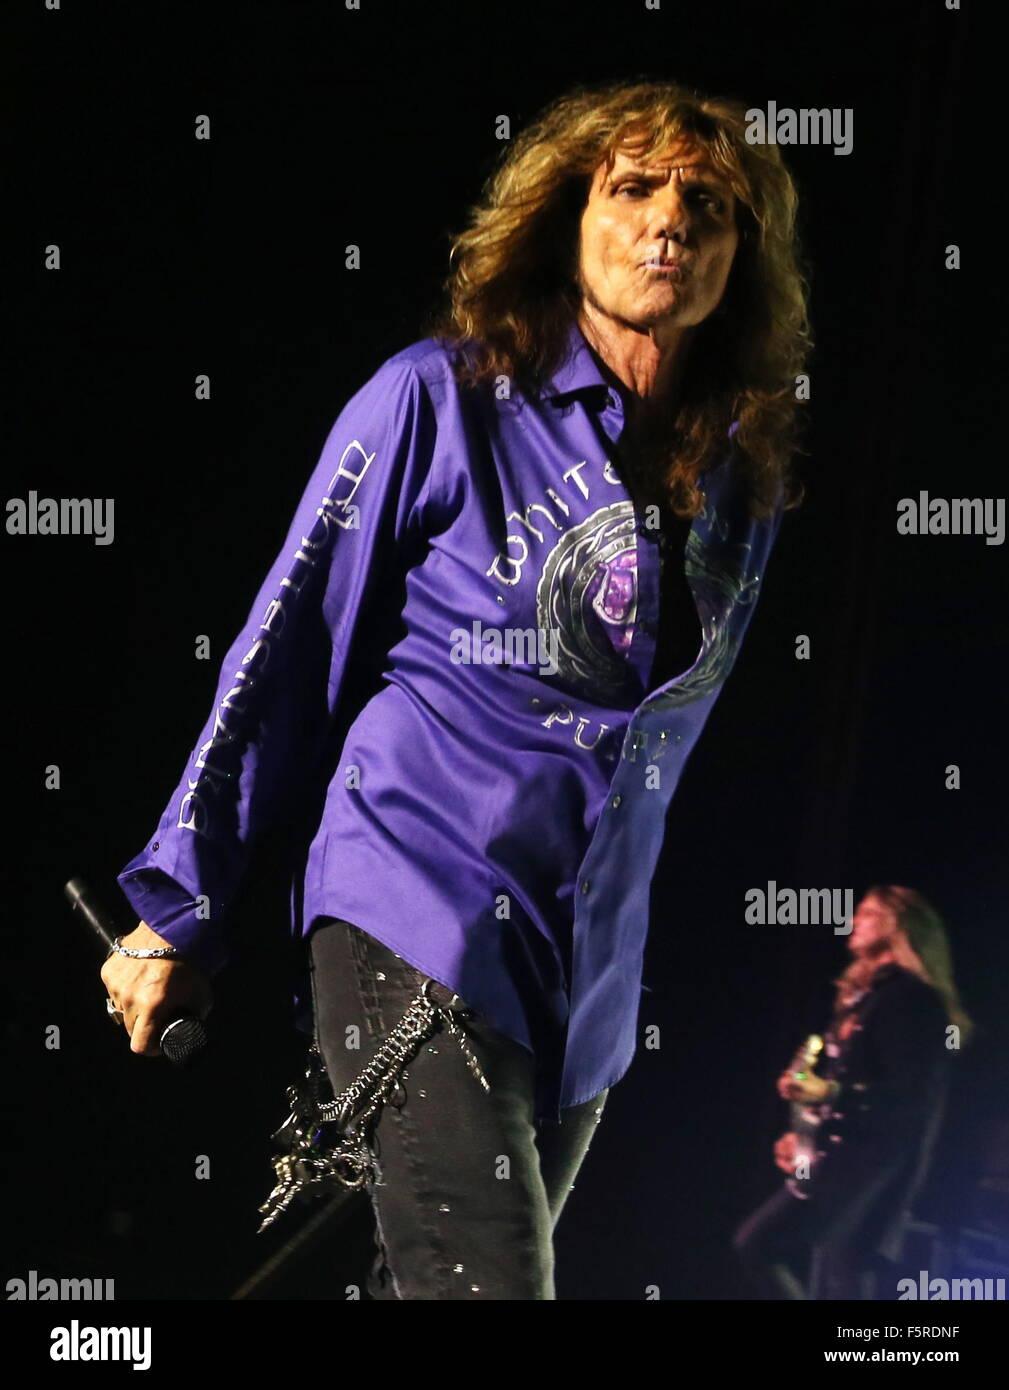 Whitesnake Lead Singer Whitesnake Stock Photos Amp Whitesnake Stock Images Alamy